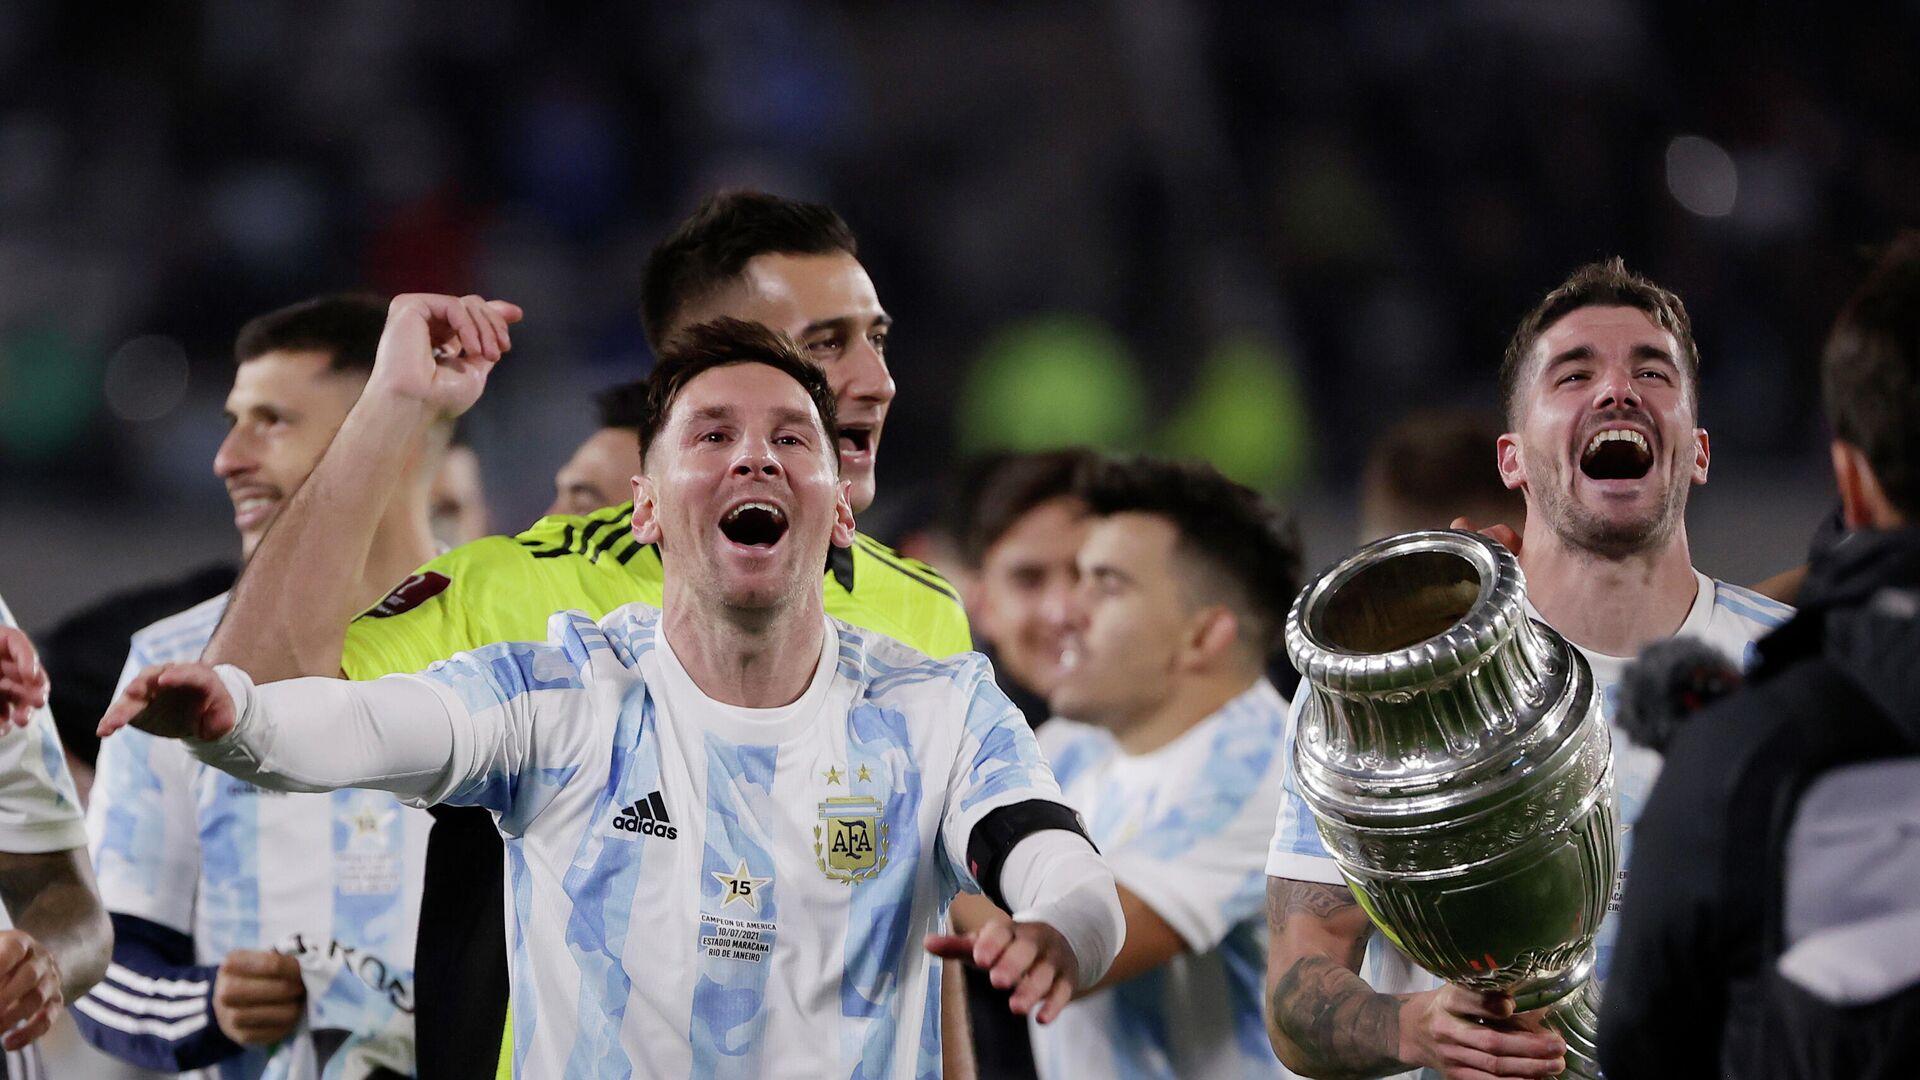 Lionel Messi am 9. September 2021 in  Buenos Aires, Argentinien - SNA, 1920, 10.09.2021